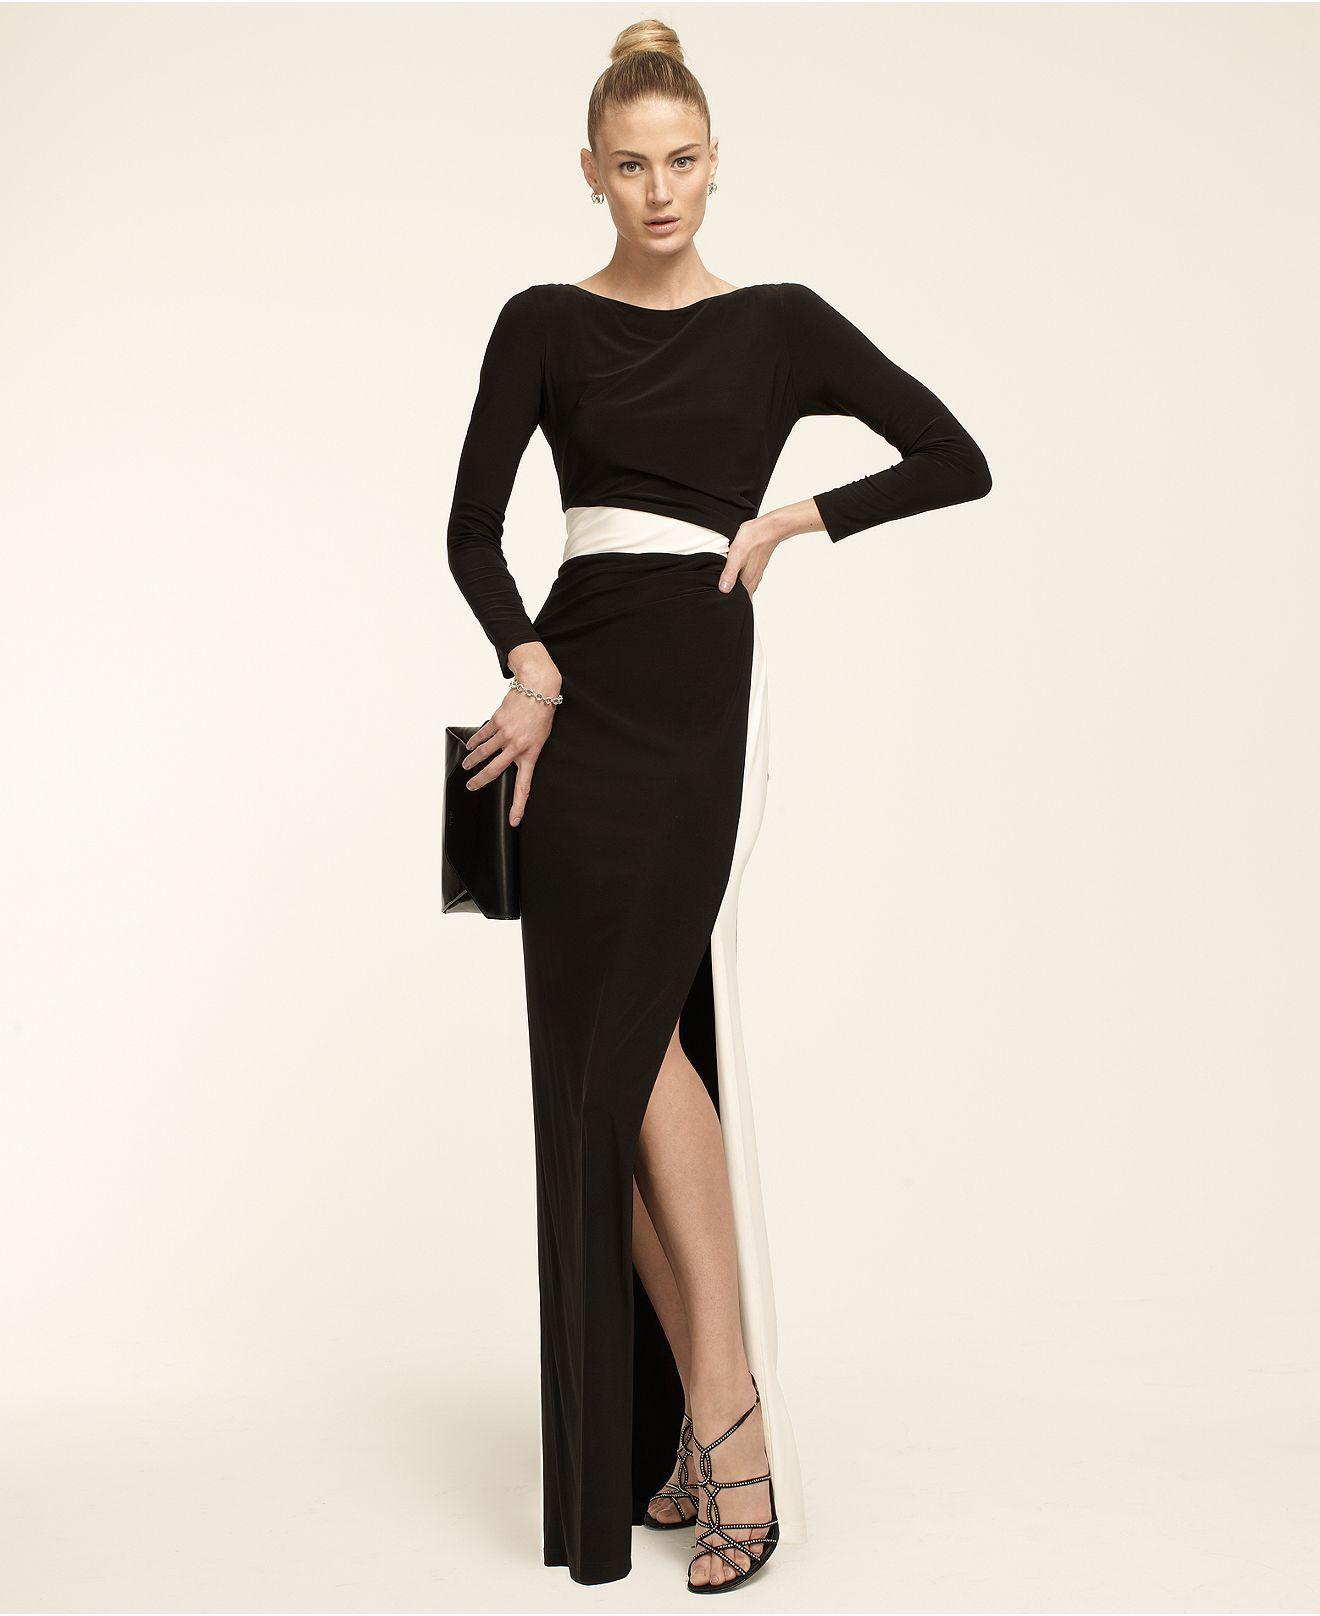 3003b98188dcd Lauren Ralph Lauren Long-Sleeve Colorblocked Gown - Dresses - Women - Macy's  | Dresses & Fashion | Pinterest | Ralph lauren long sleeve, Gowns and Woman